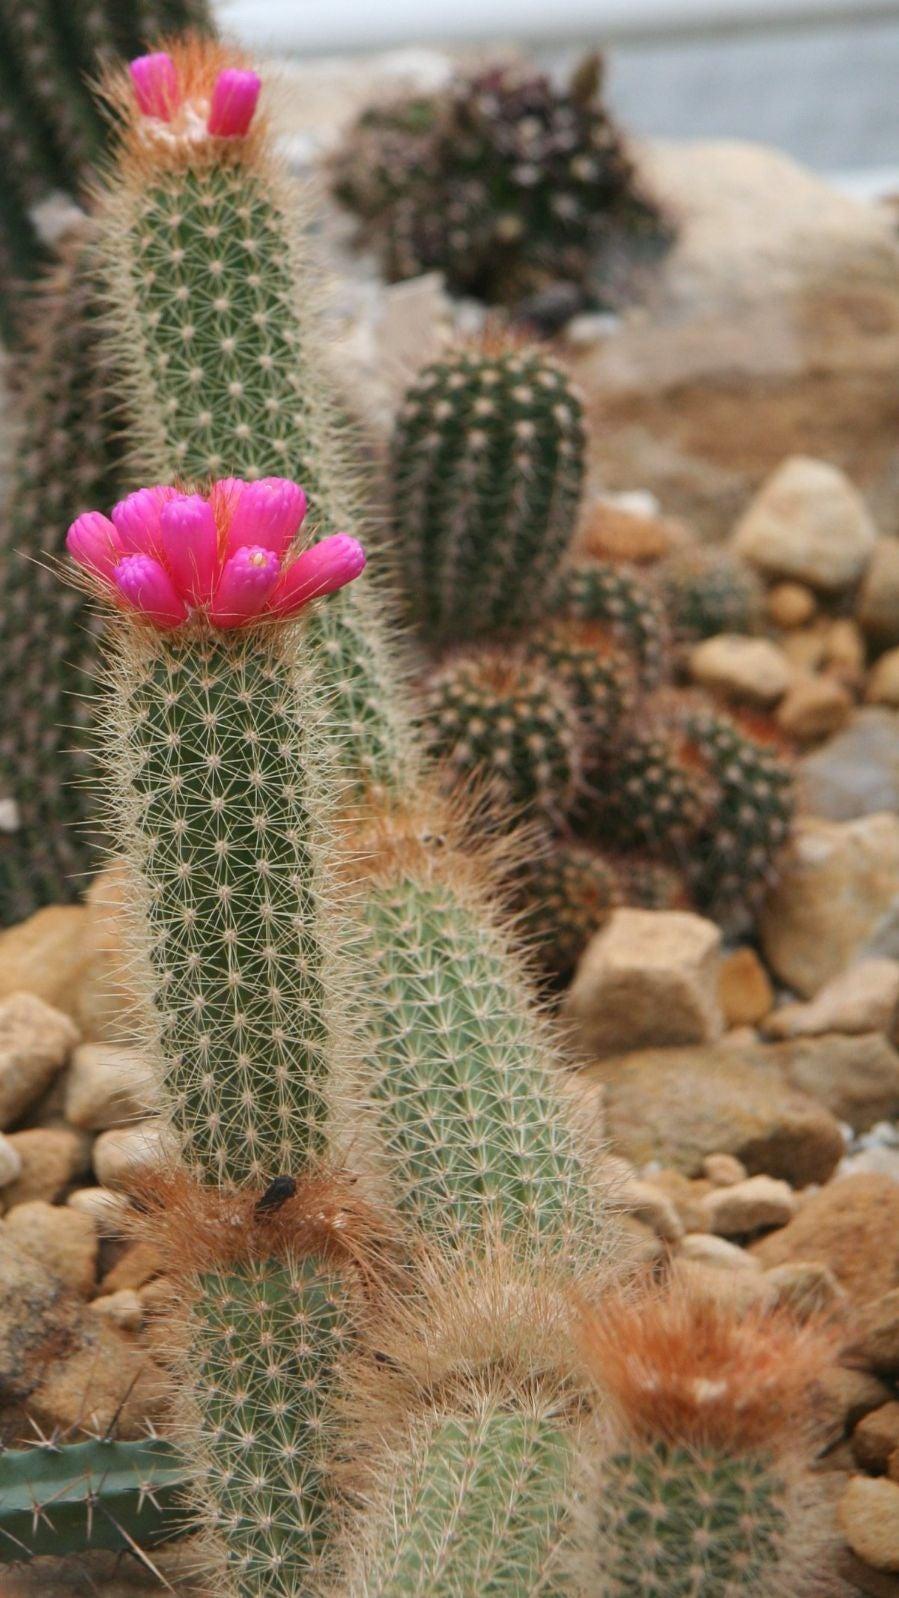 100 Arrojadoa aureispina cactus seeds